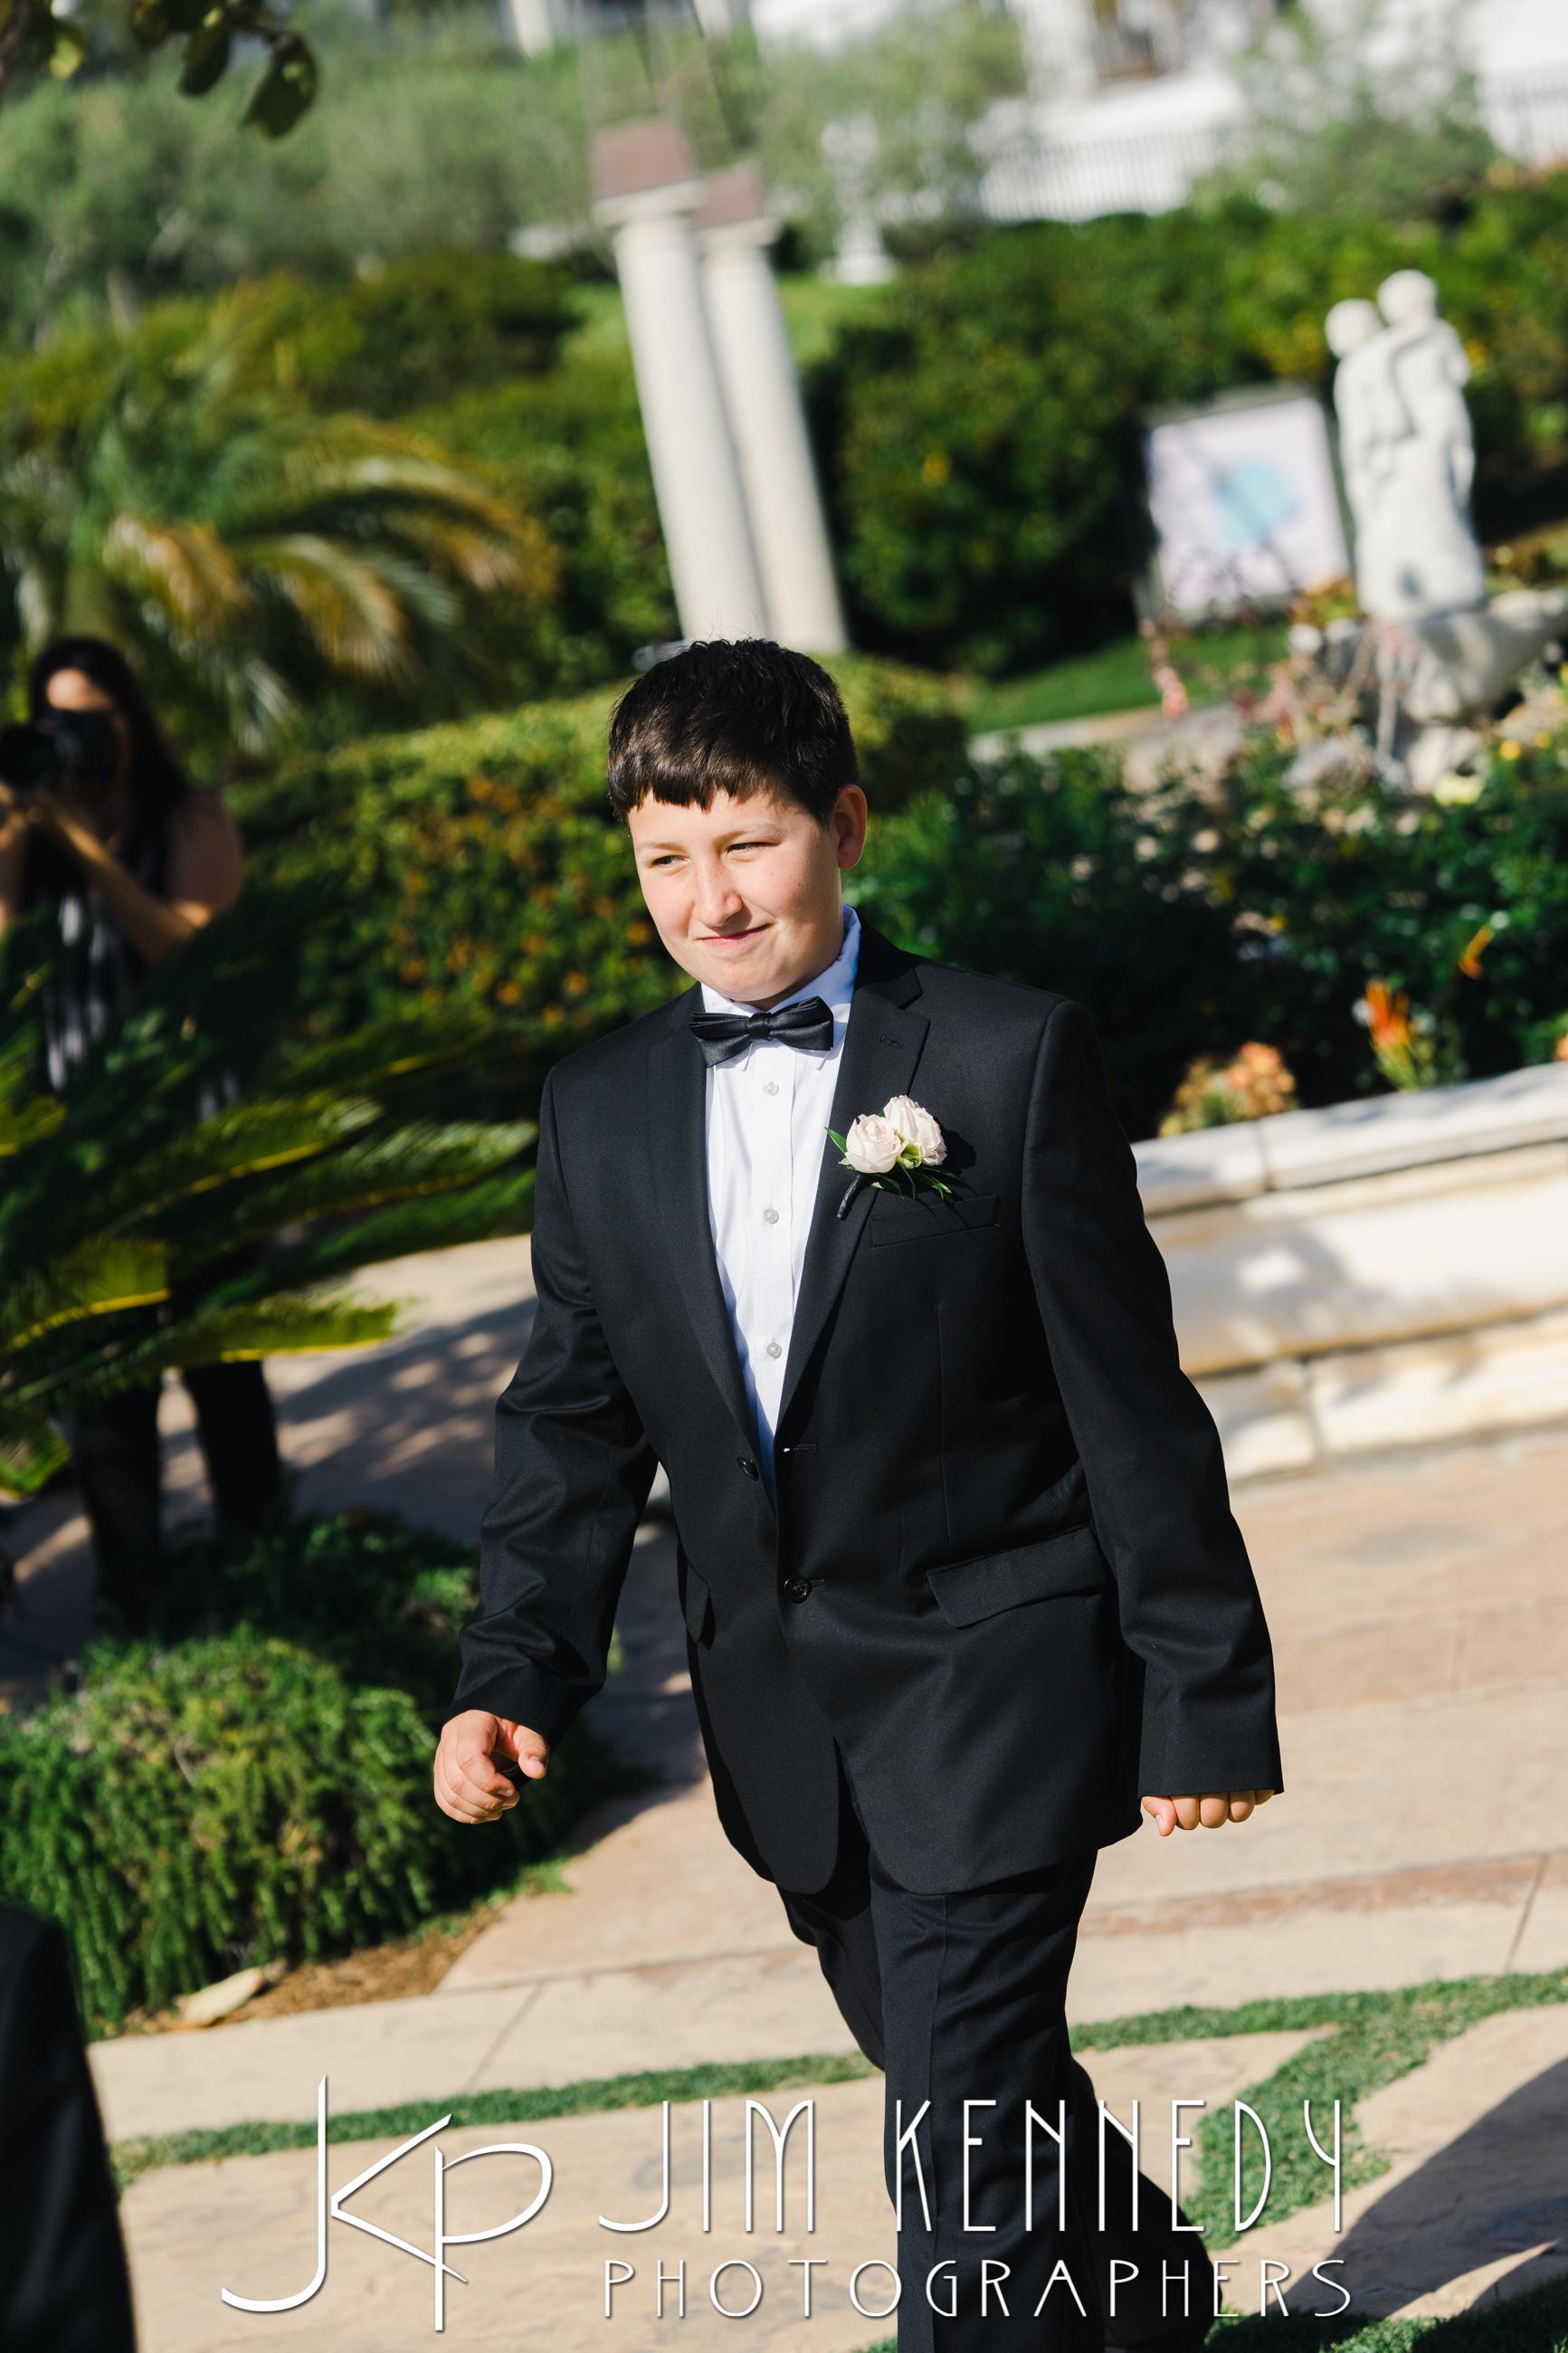 monarch-beach-resort-wedding-JKP_0055.JPG